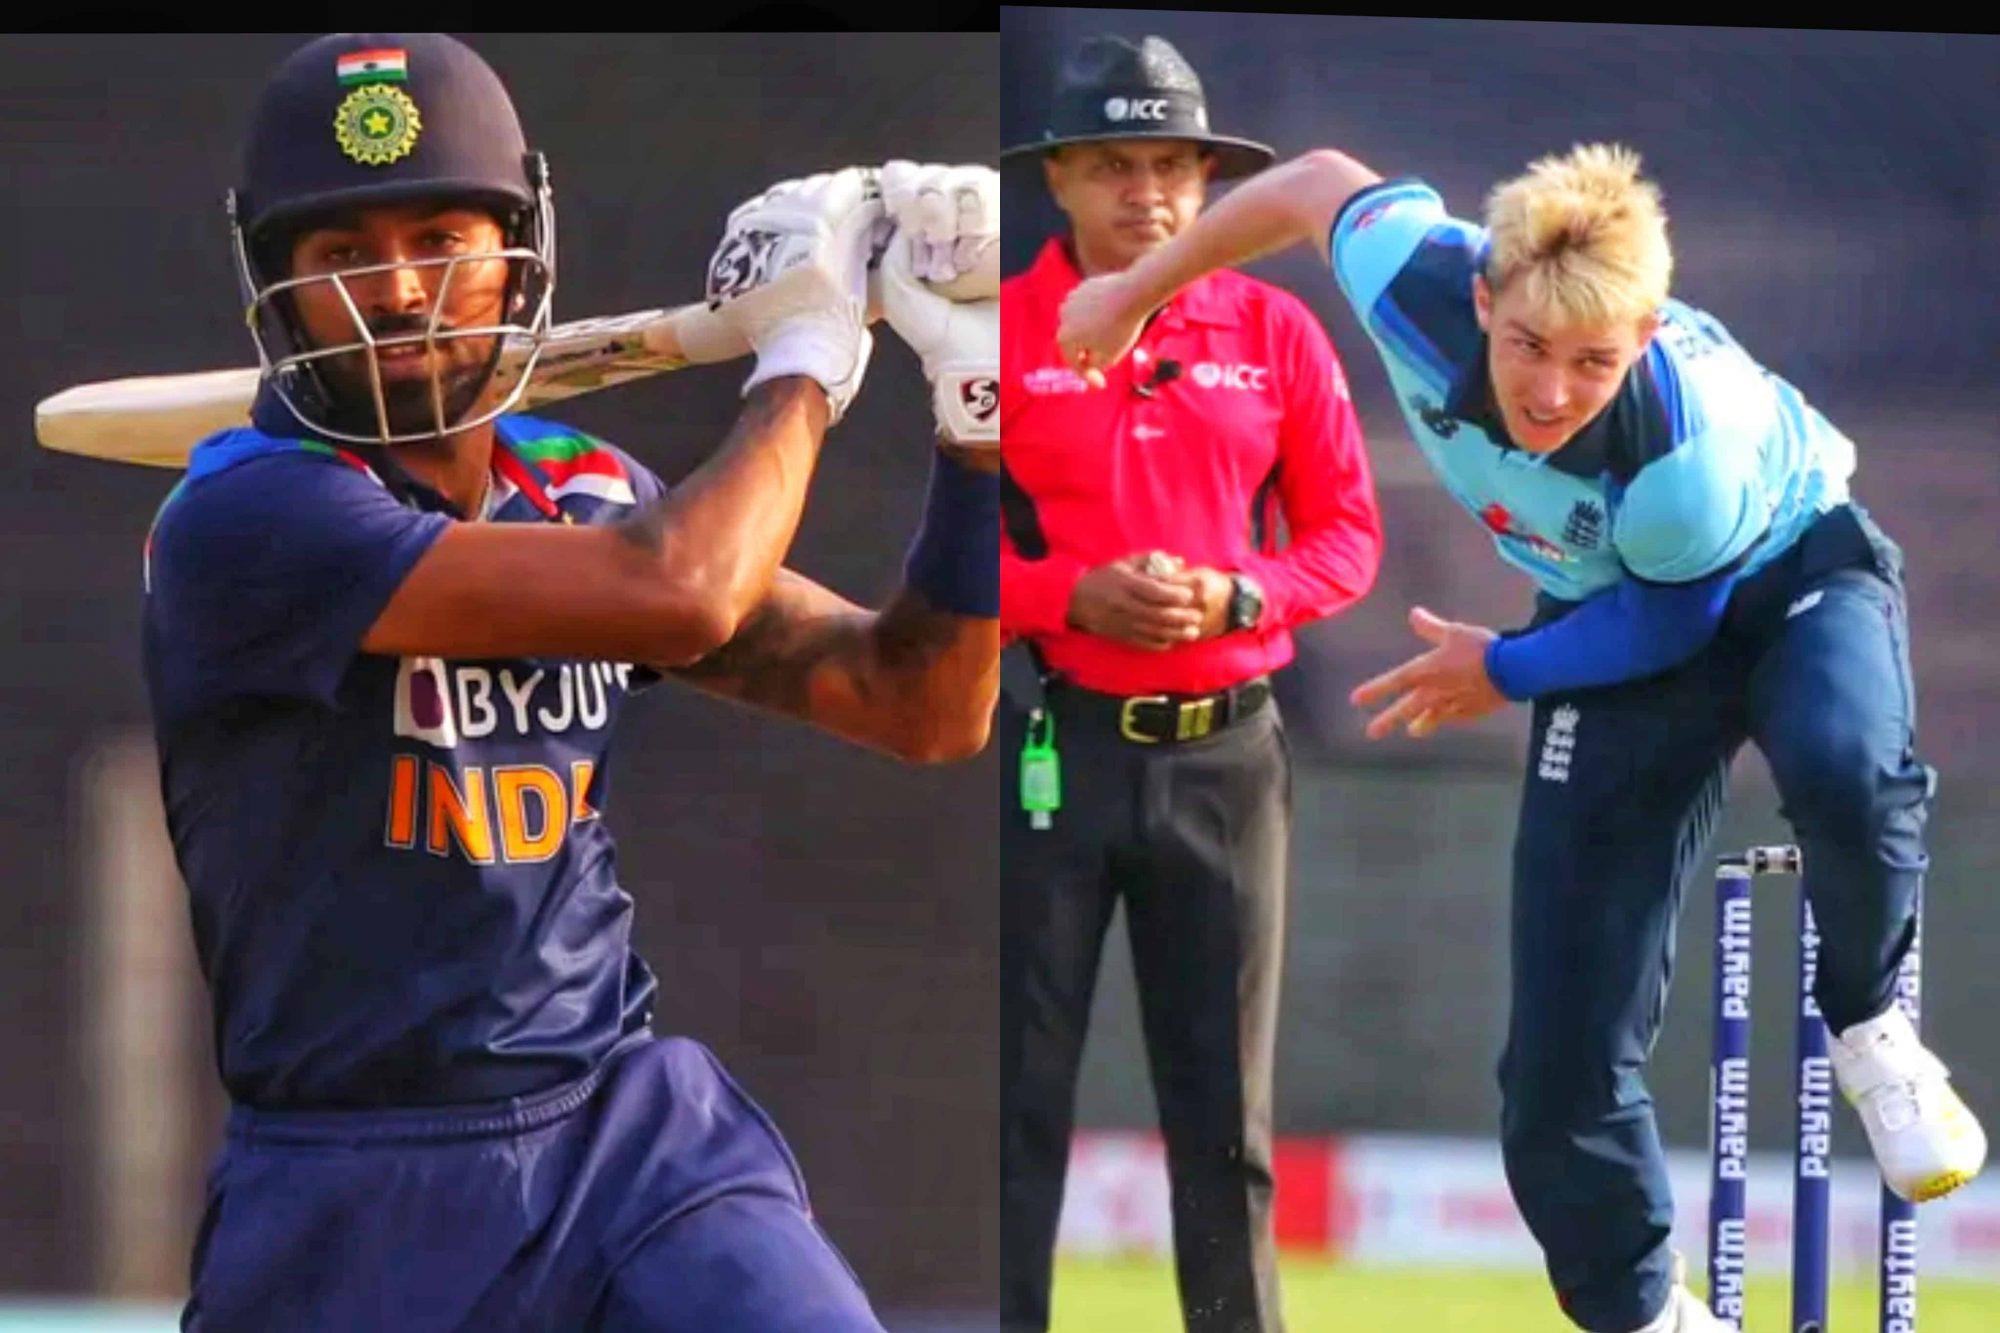 Watch: Sam Curran And Hardik Pandya Engage In A Heated Argument During 2nd ODI • ProBatsman